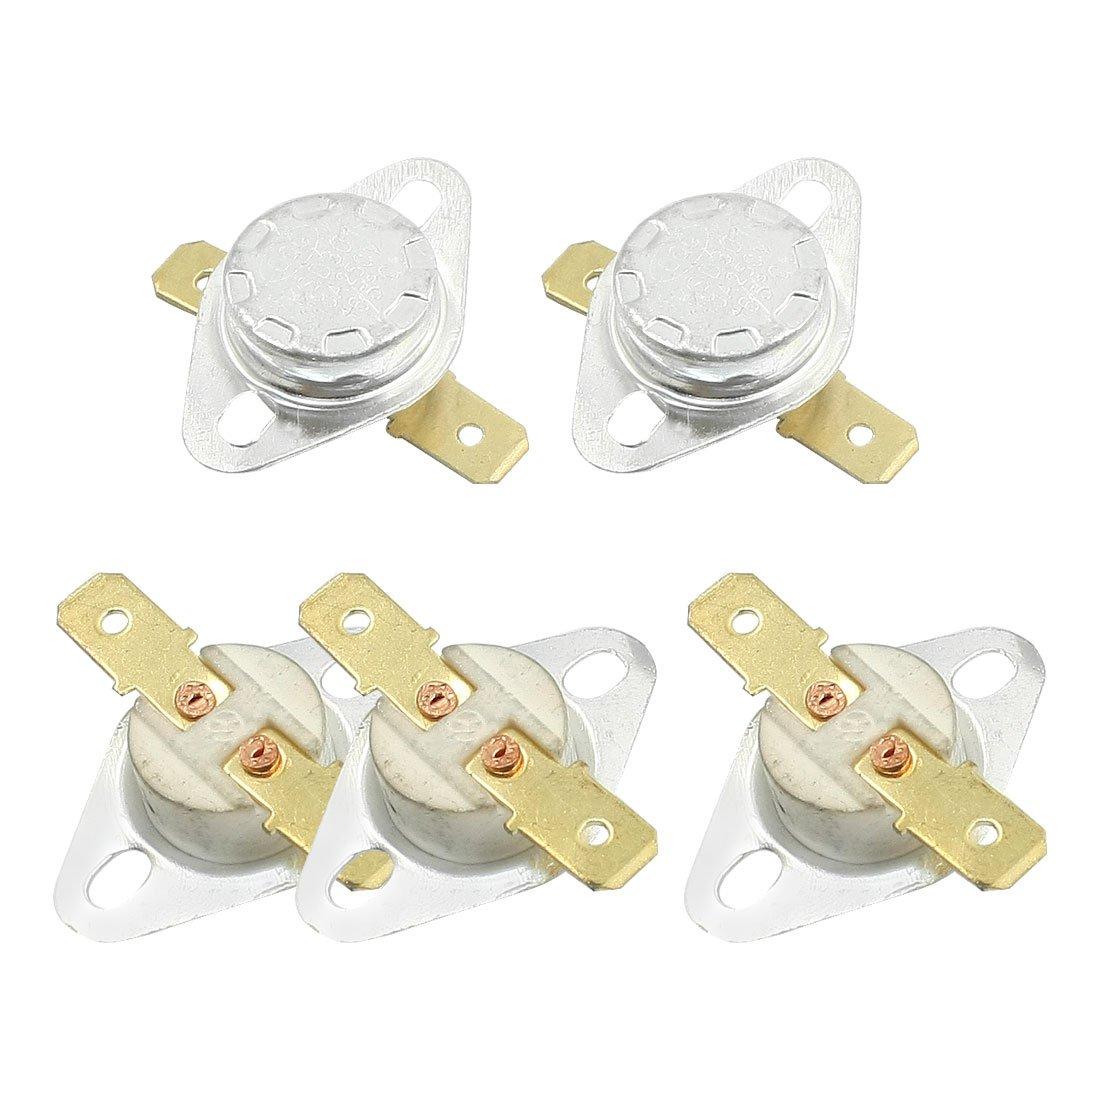 5Pcs NC Ceramic Temperature Switch 165 Degree Celsius KSD301 Sourcingmap a13092400ux0049